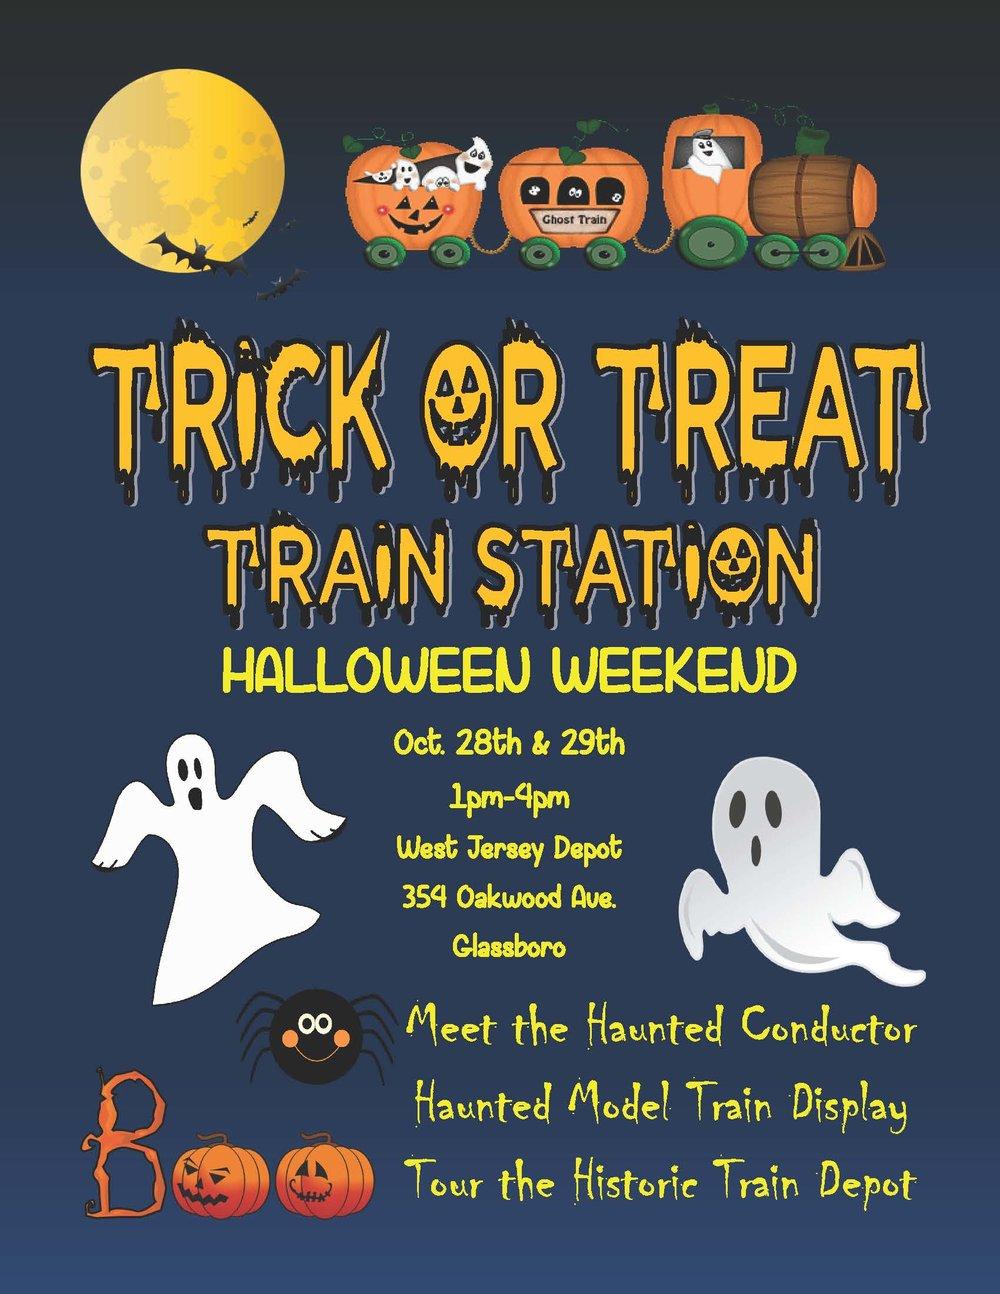 Glassboro Trick or Treat Train Station